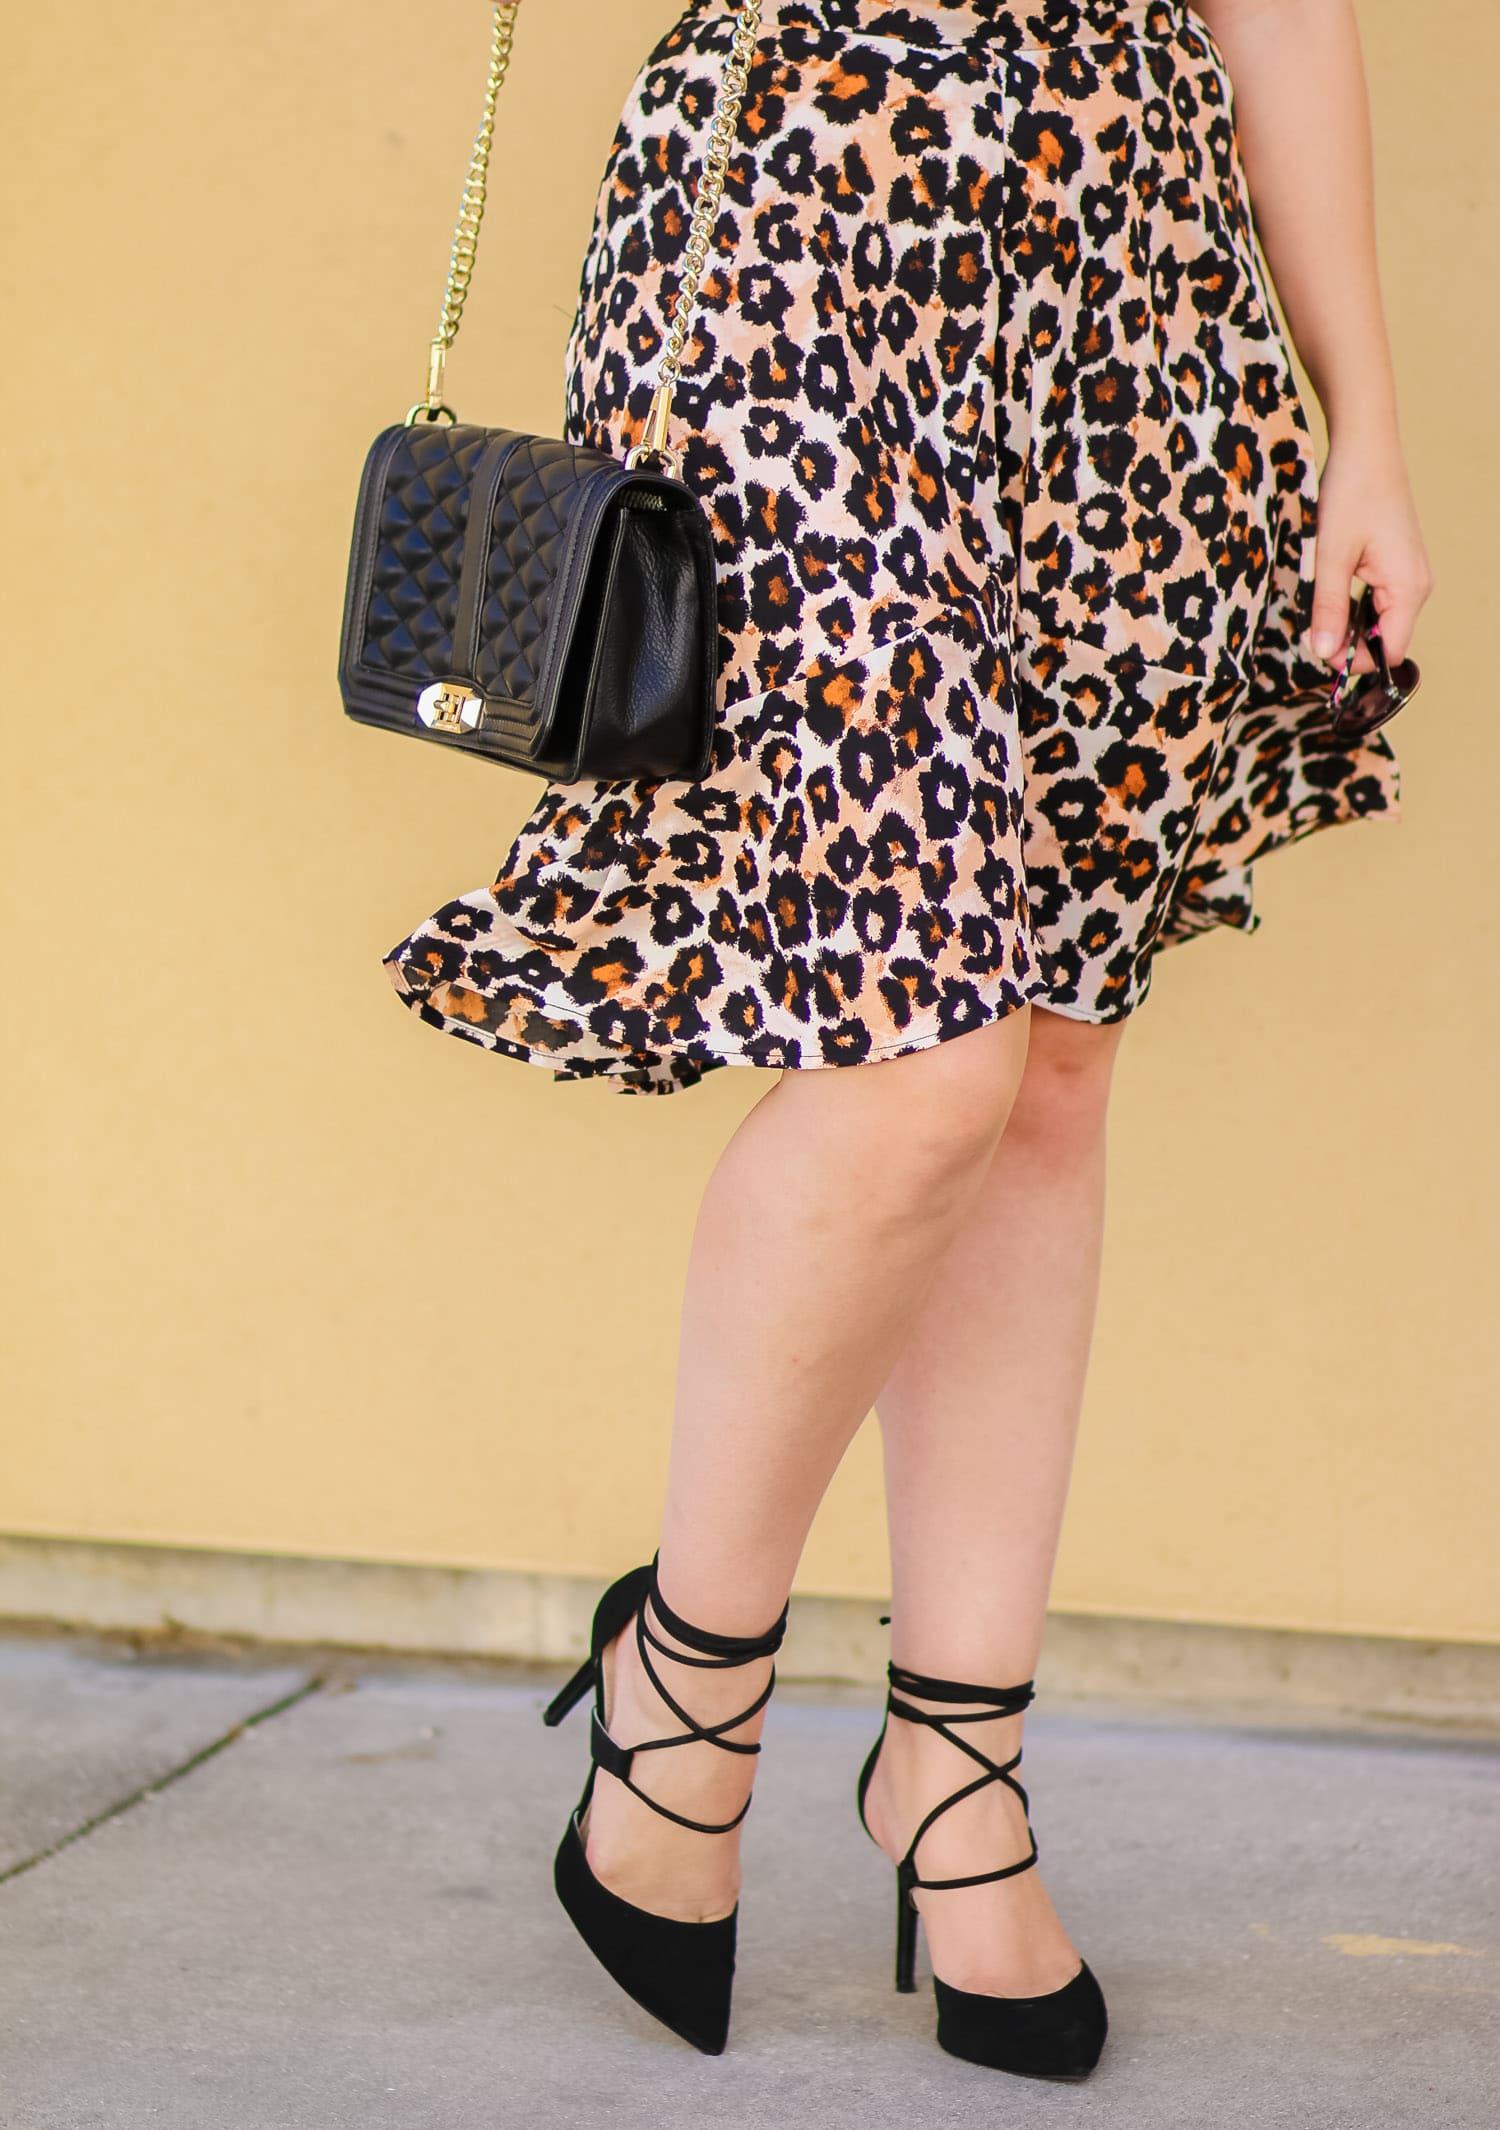 leopard-print-skirt-black-lace-up-heels-1056